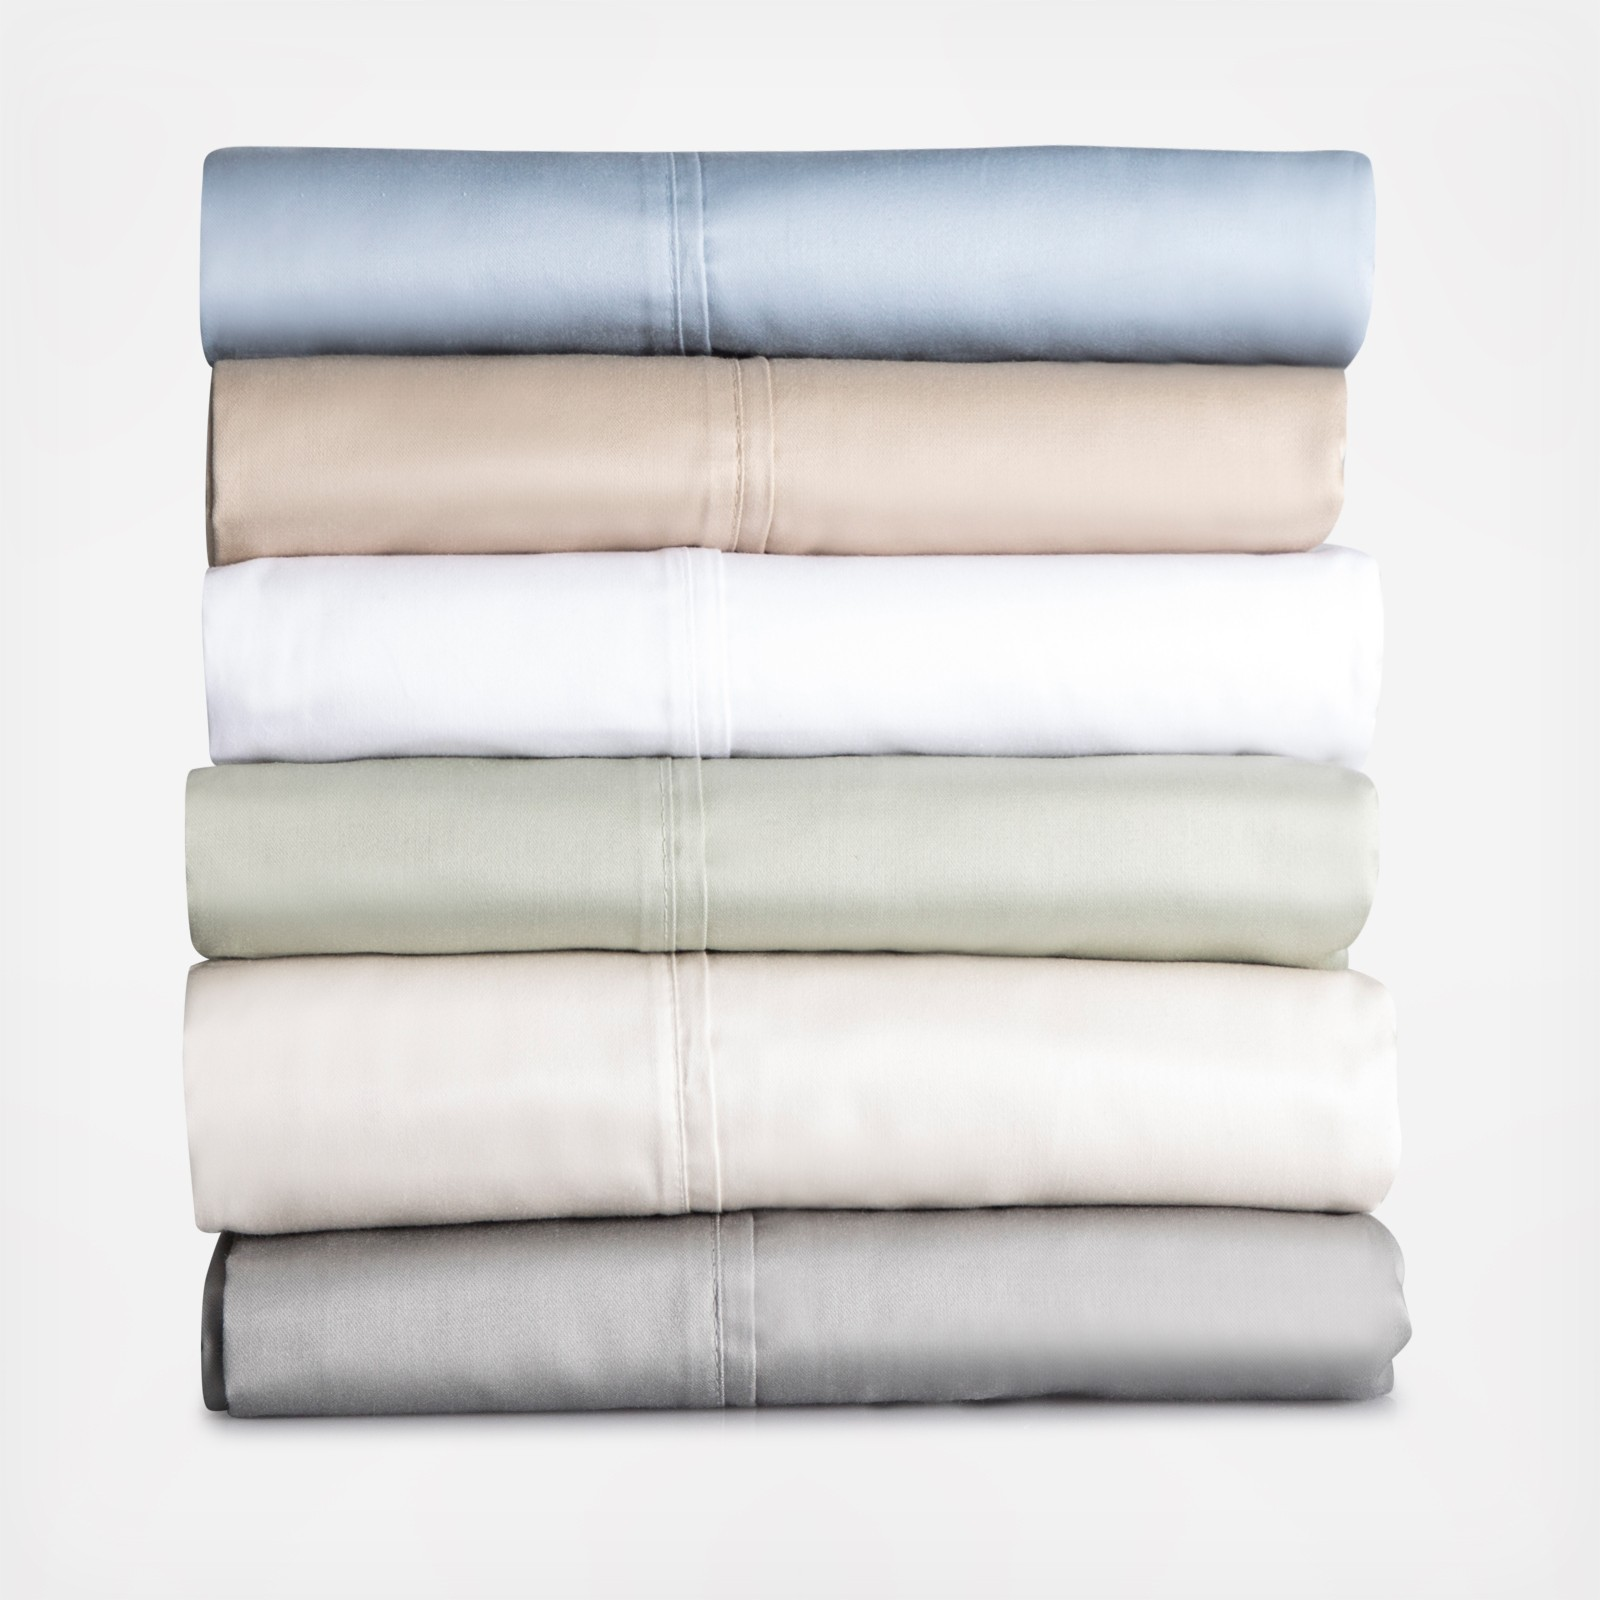 Amaze by welspun cotton sheet set bedding king navy blue - Amaze By Welspun Cotton Sheet Set Bedding King Navy Blue 22